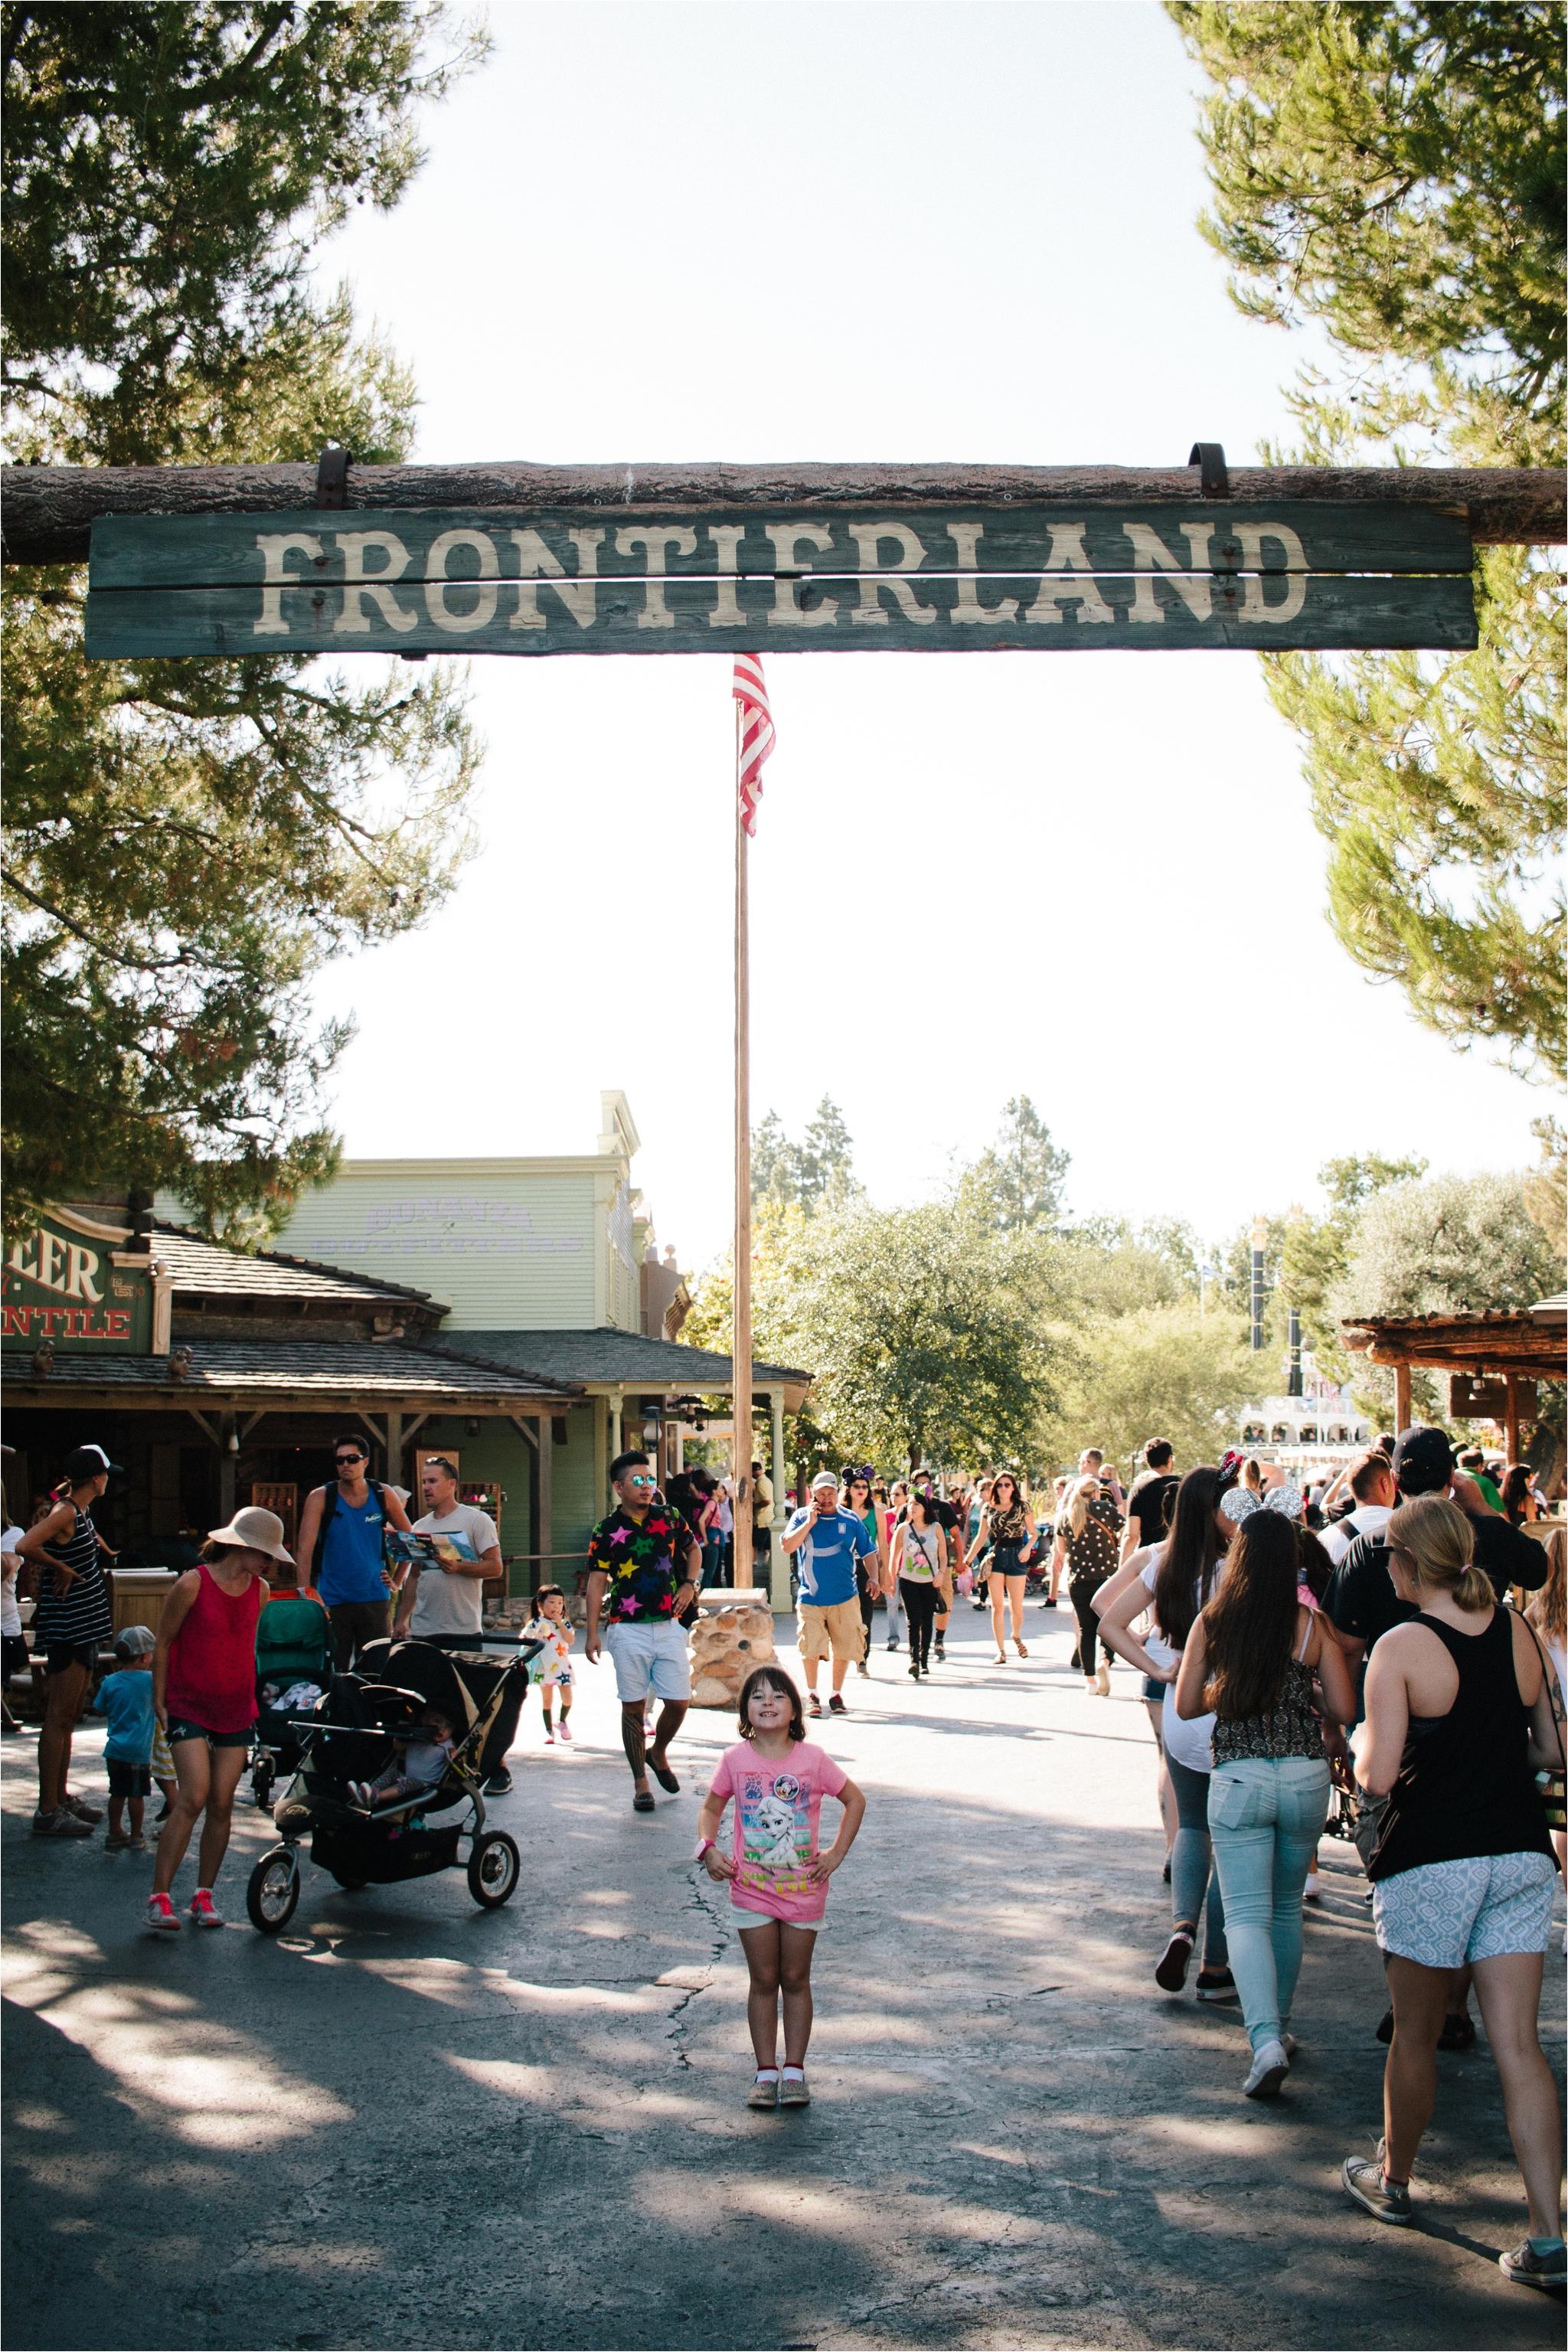 Disneylandroundtwopersonalimages_0027.jpg